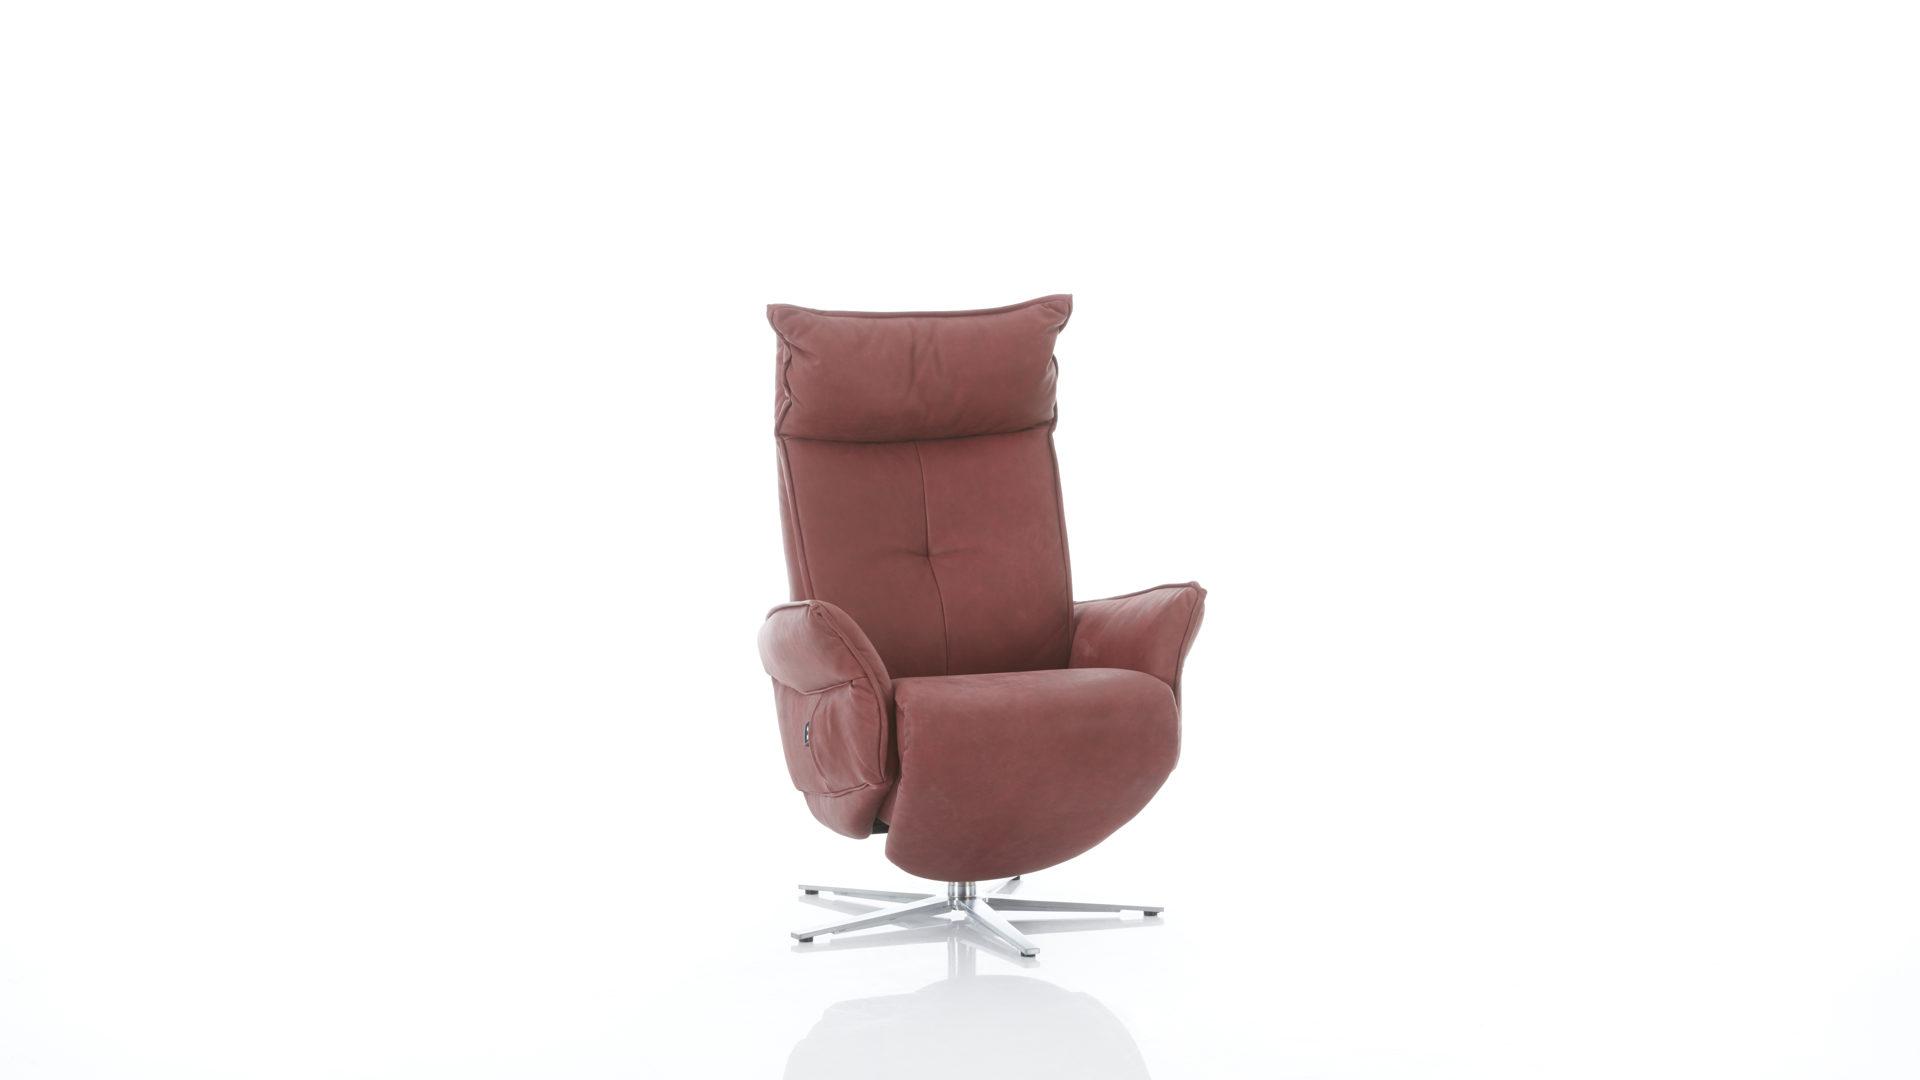 Interliving Sessel Serie 4500 Easy Swing Sessel Merlotfarbenes